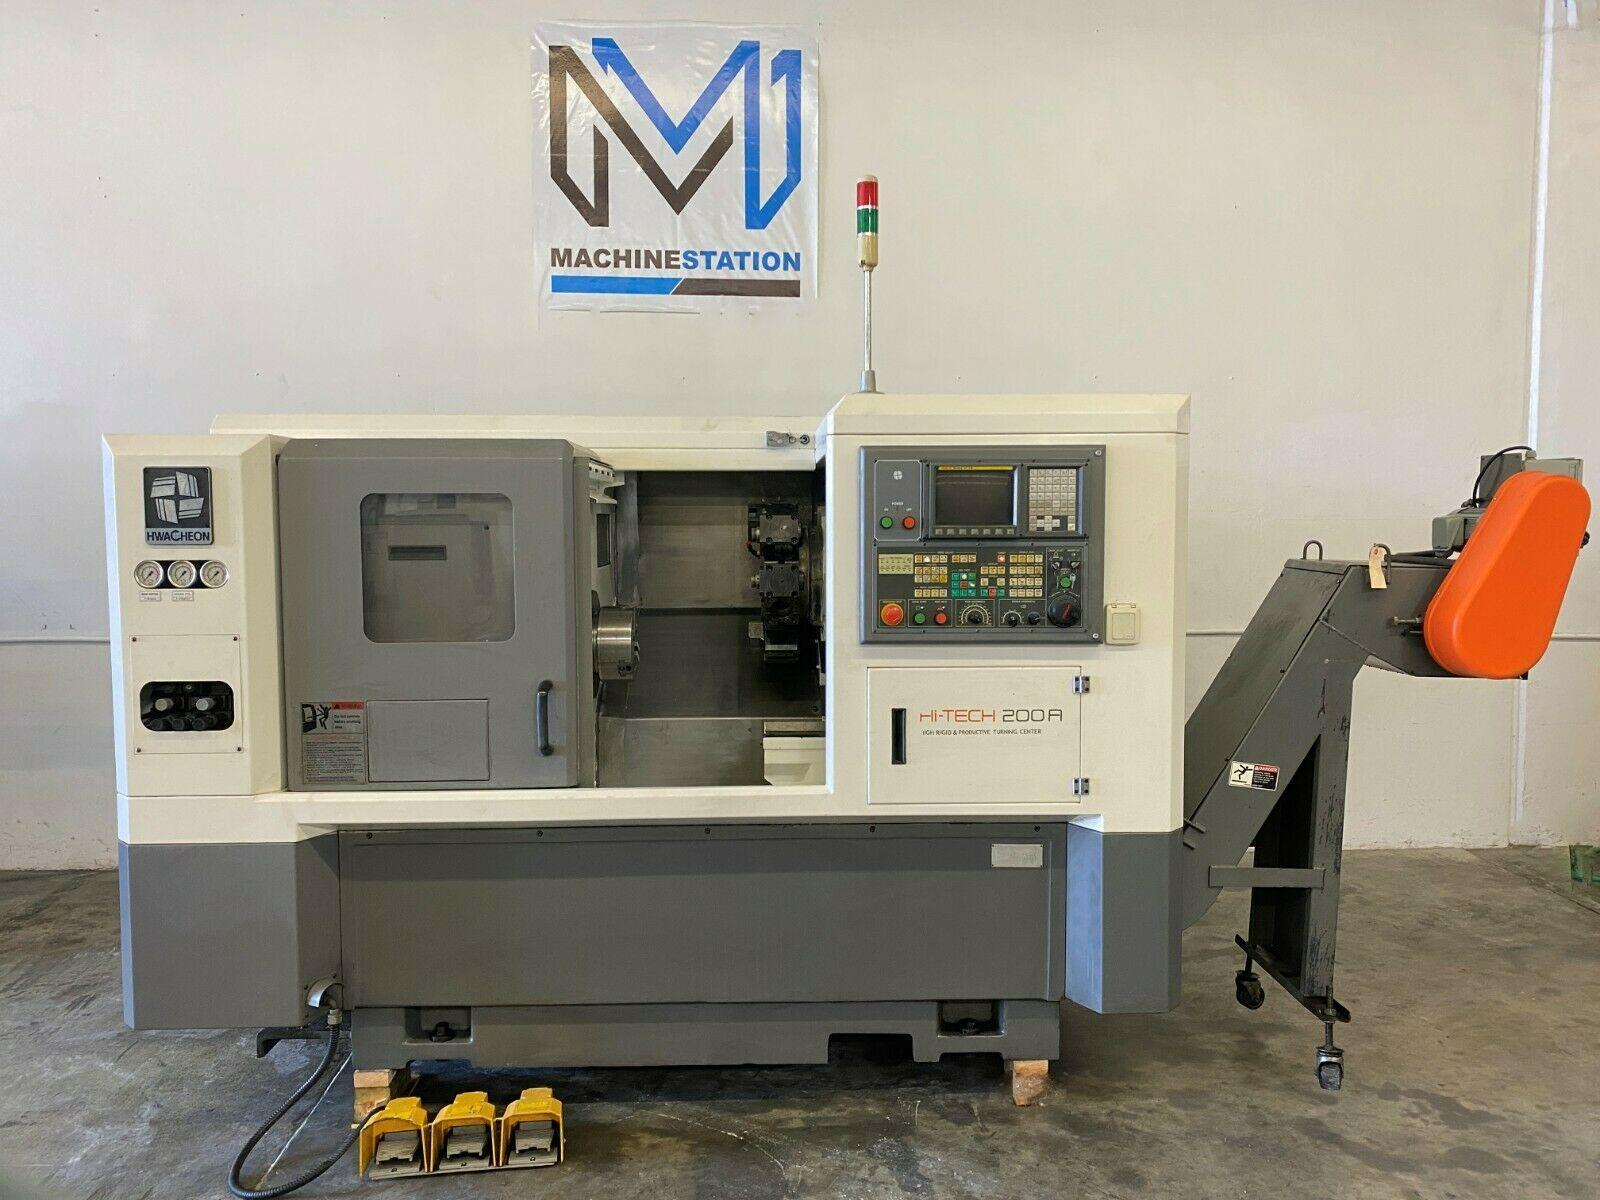 HWACHEON HI-TECH 200A CNC TURN MILL